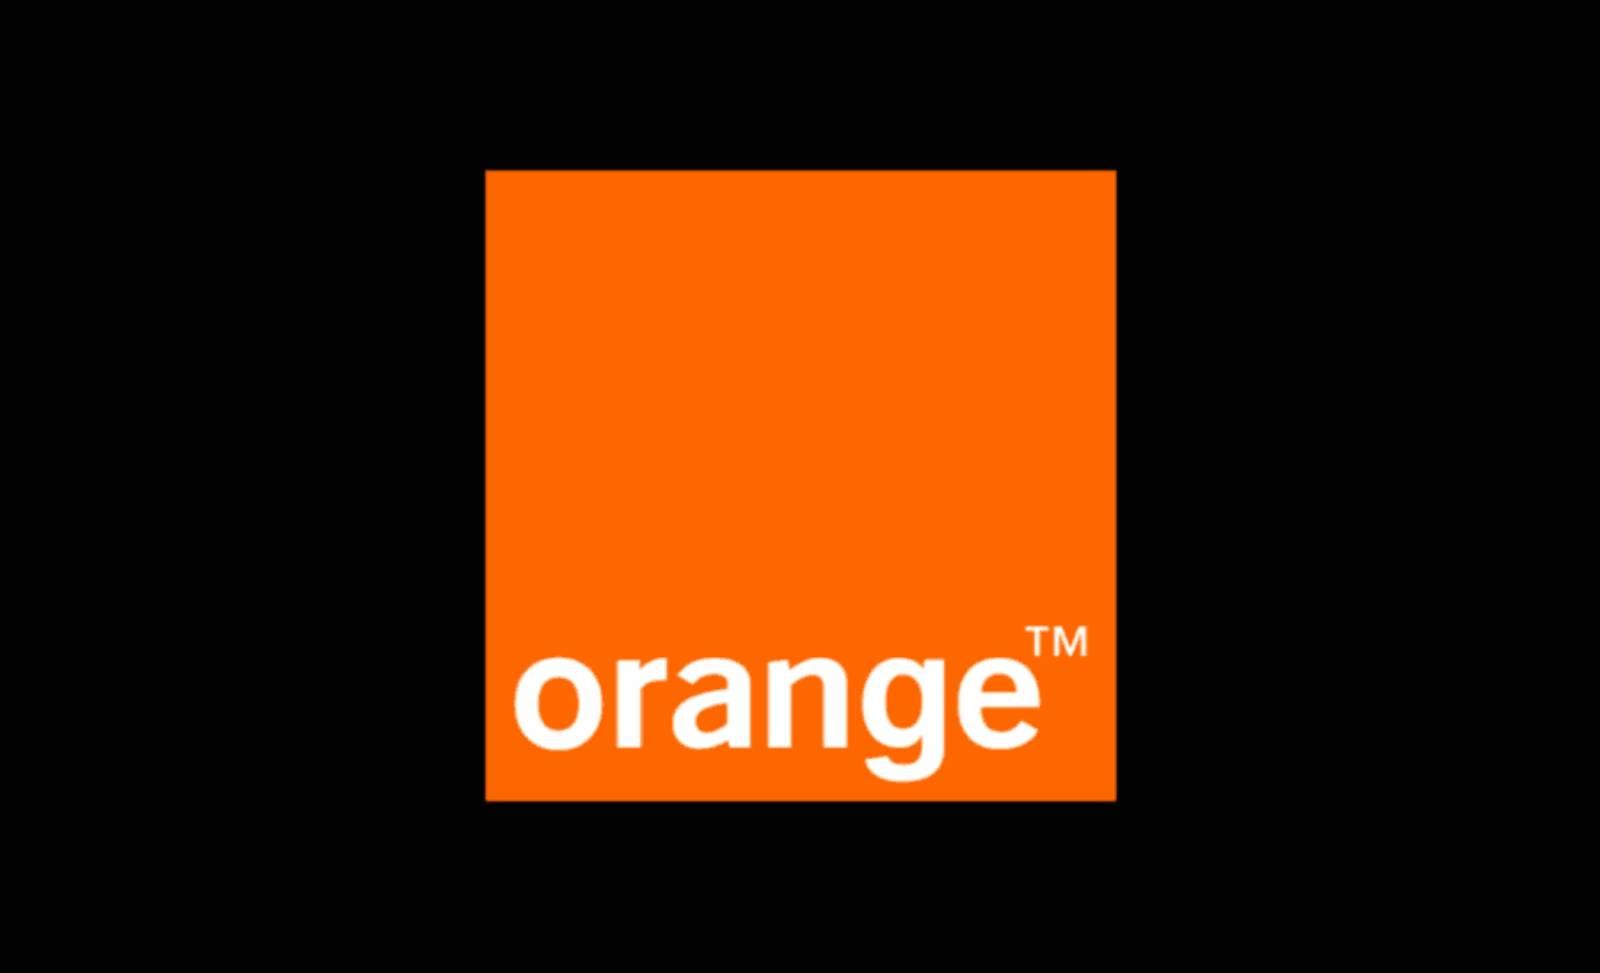 Orange polaroid